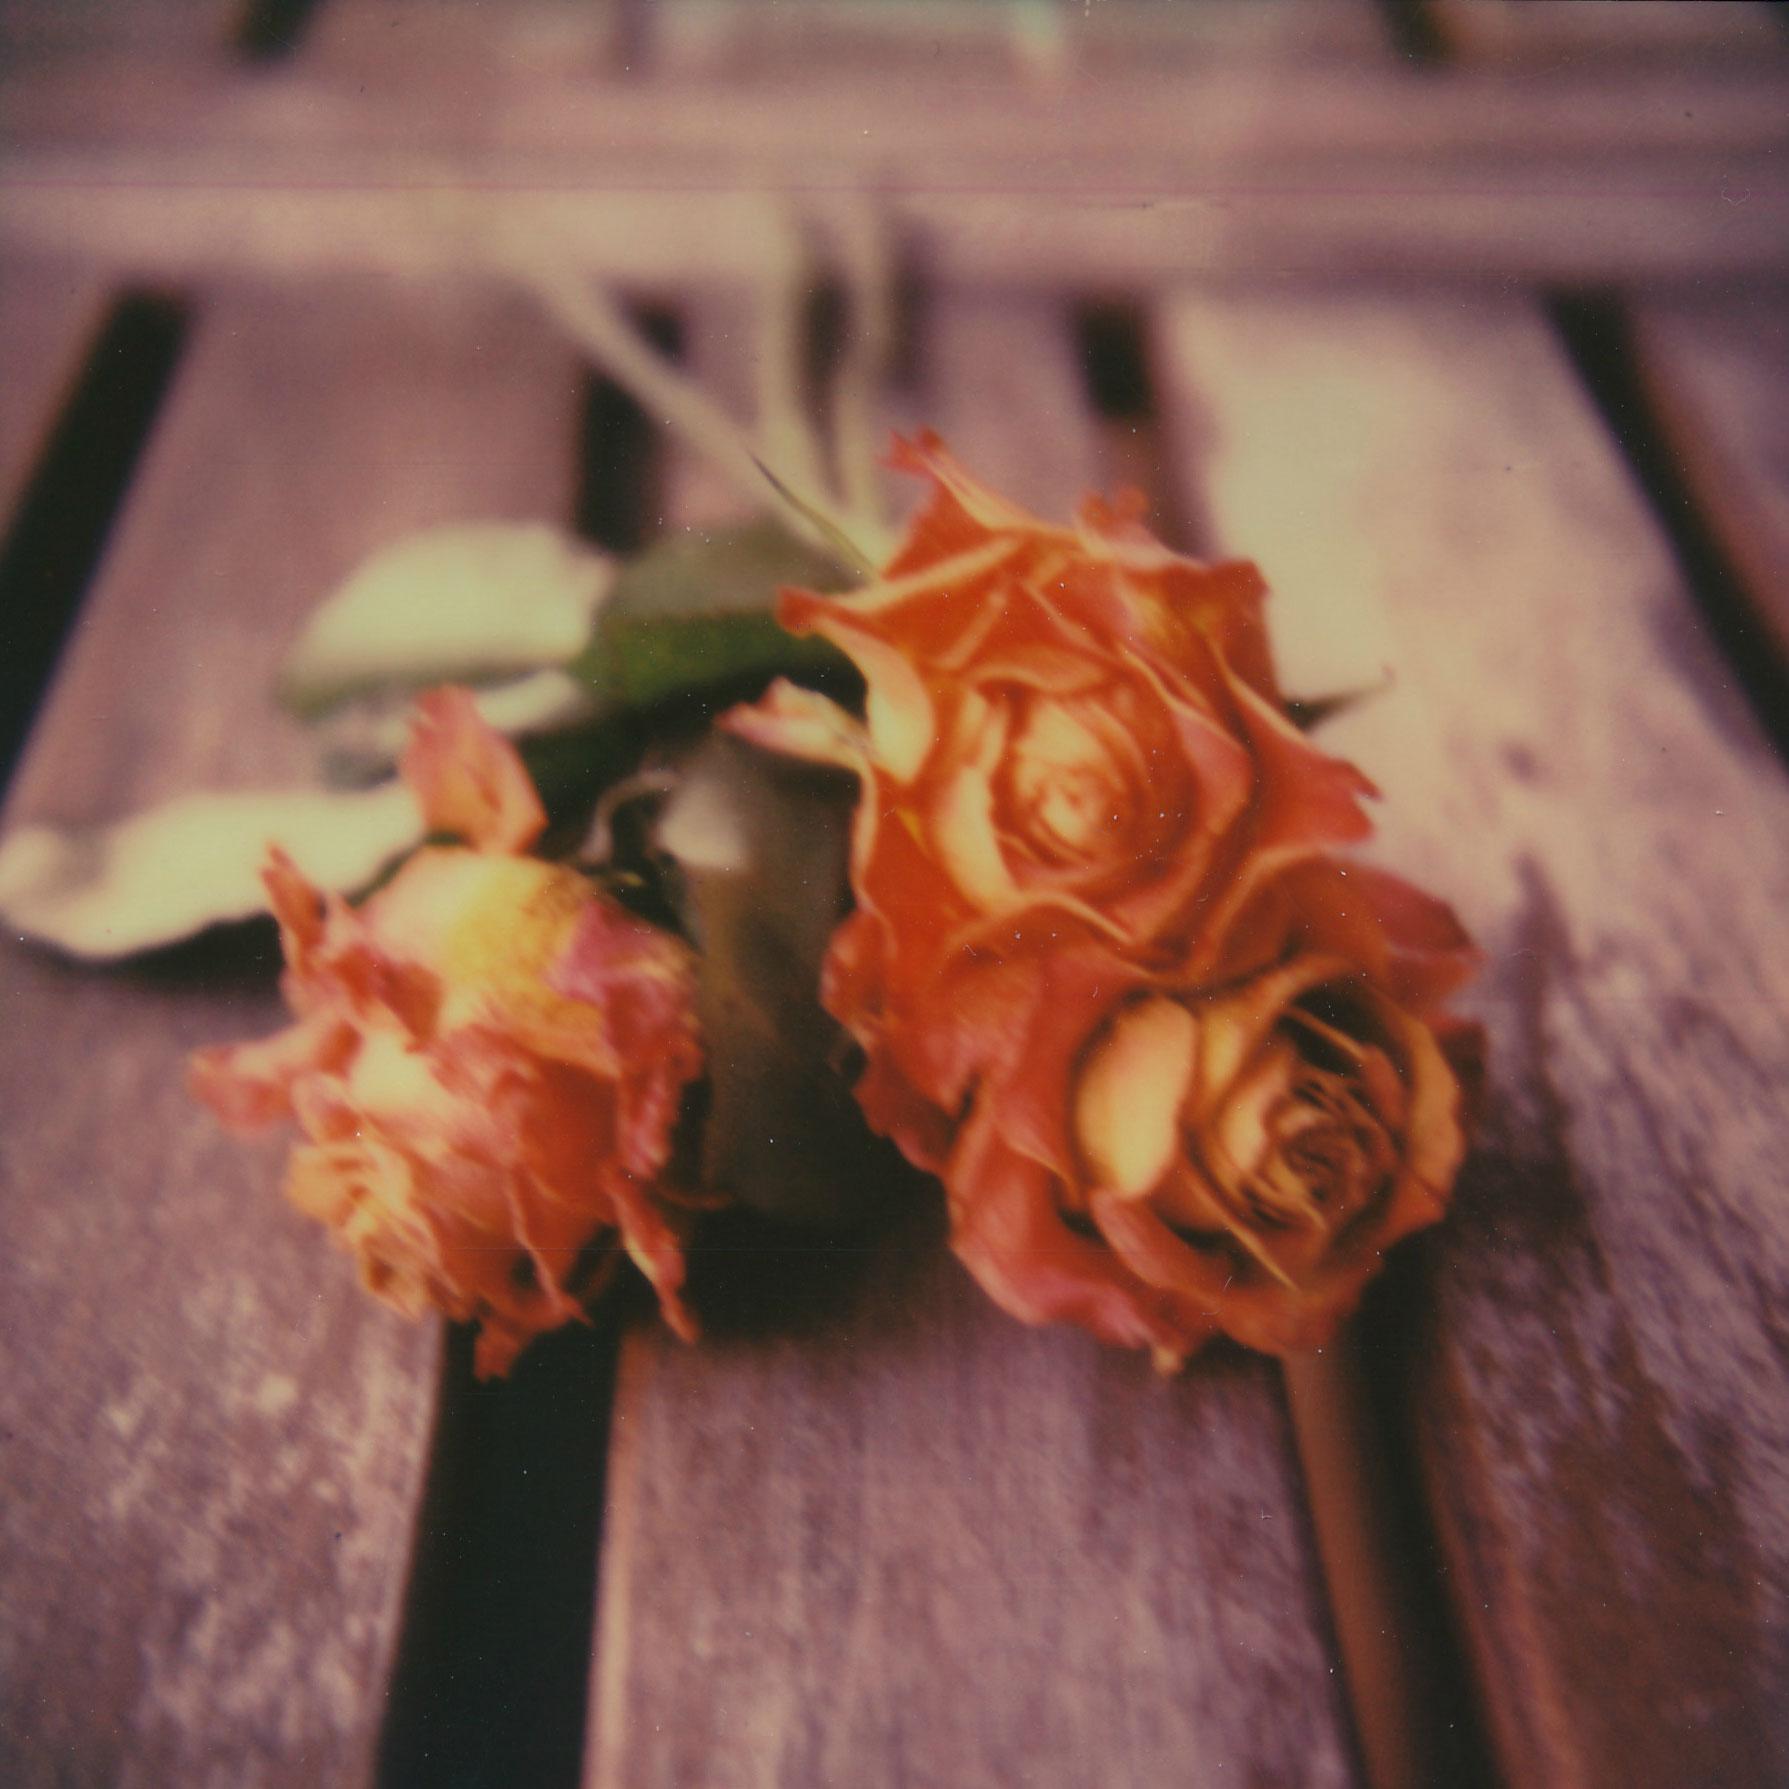 roses_sx70_sarahbucher.jpg